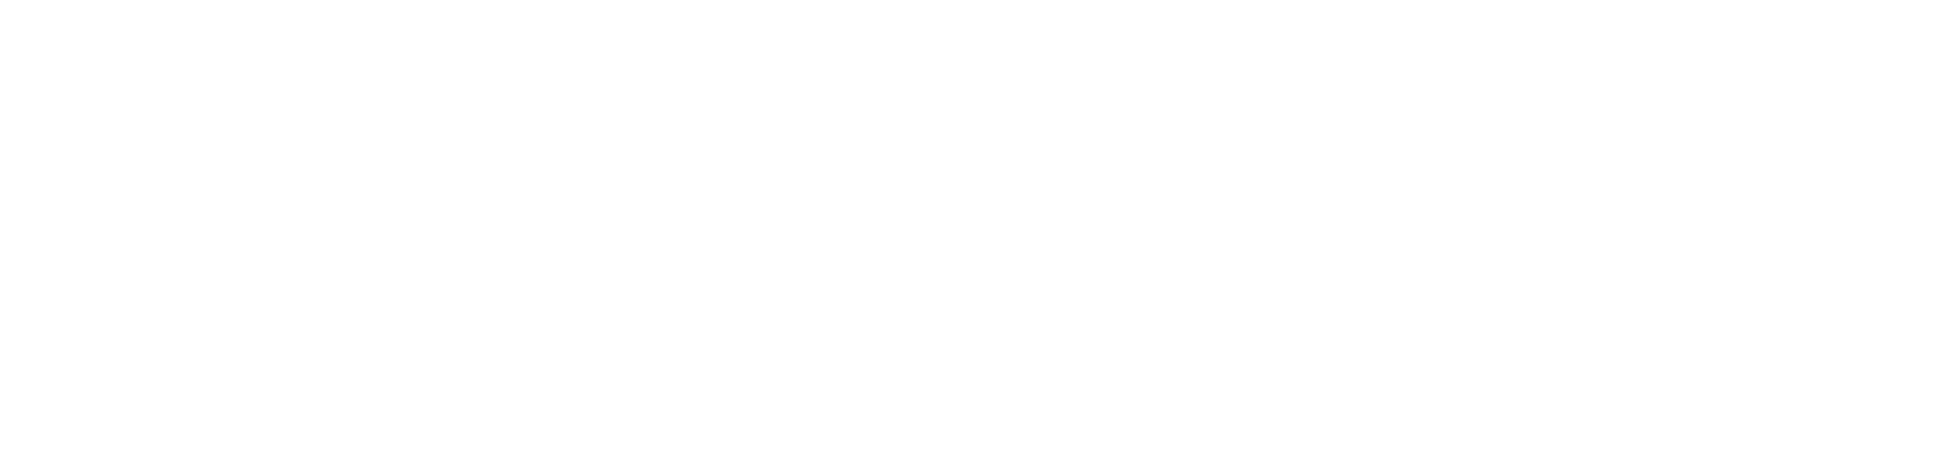 ilayda web tasarım